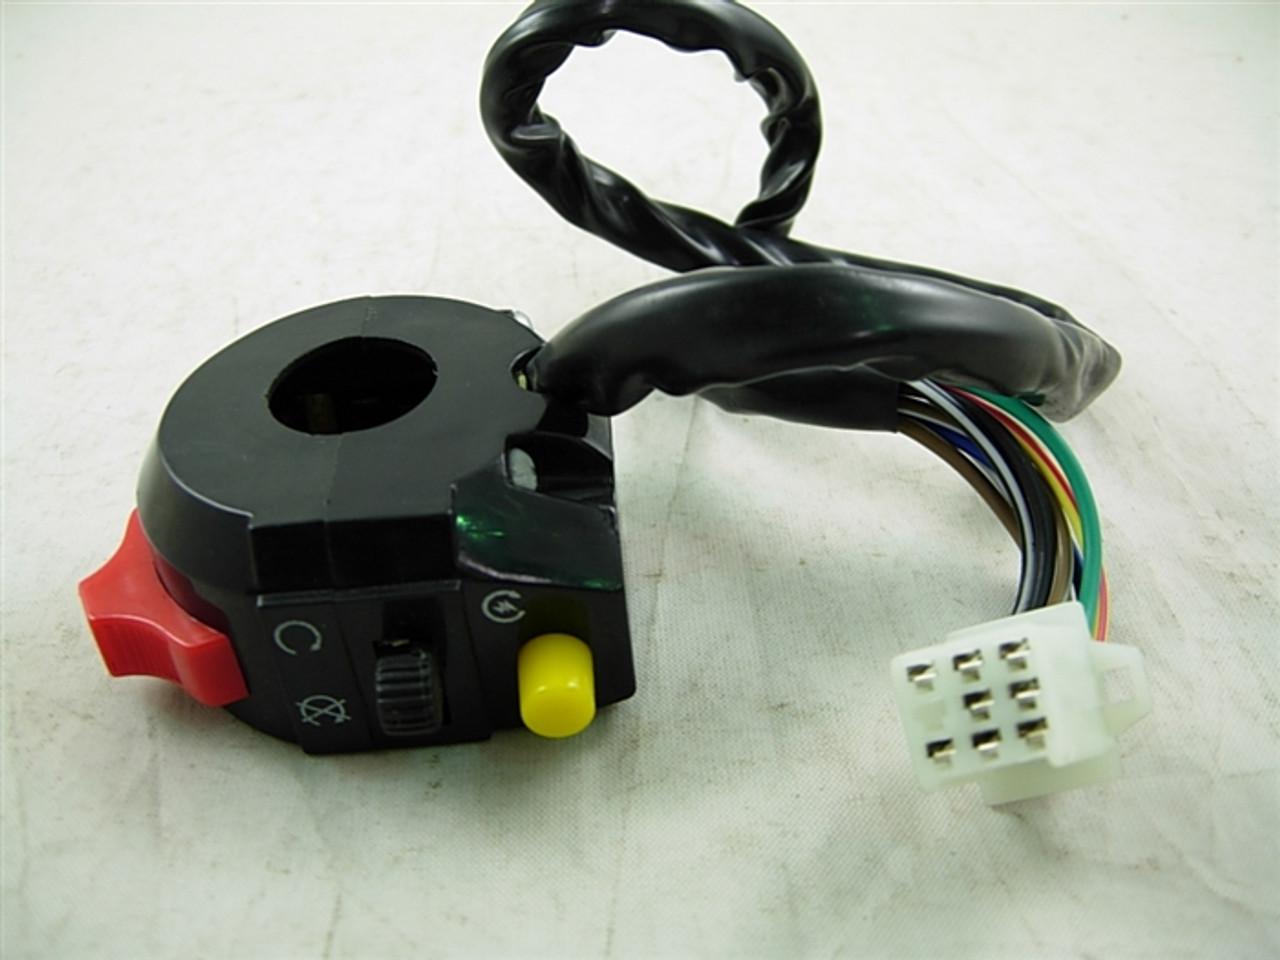 KILL /HEADLIGHT/ELECTRIC START SWITCH 10510-A29-6